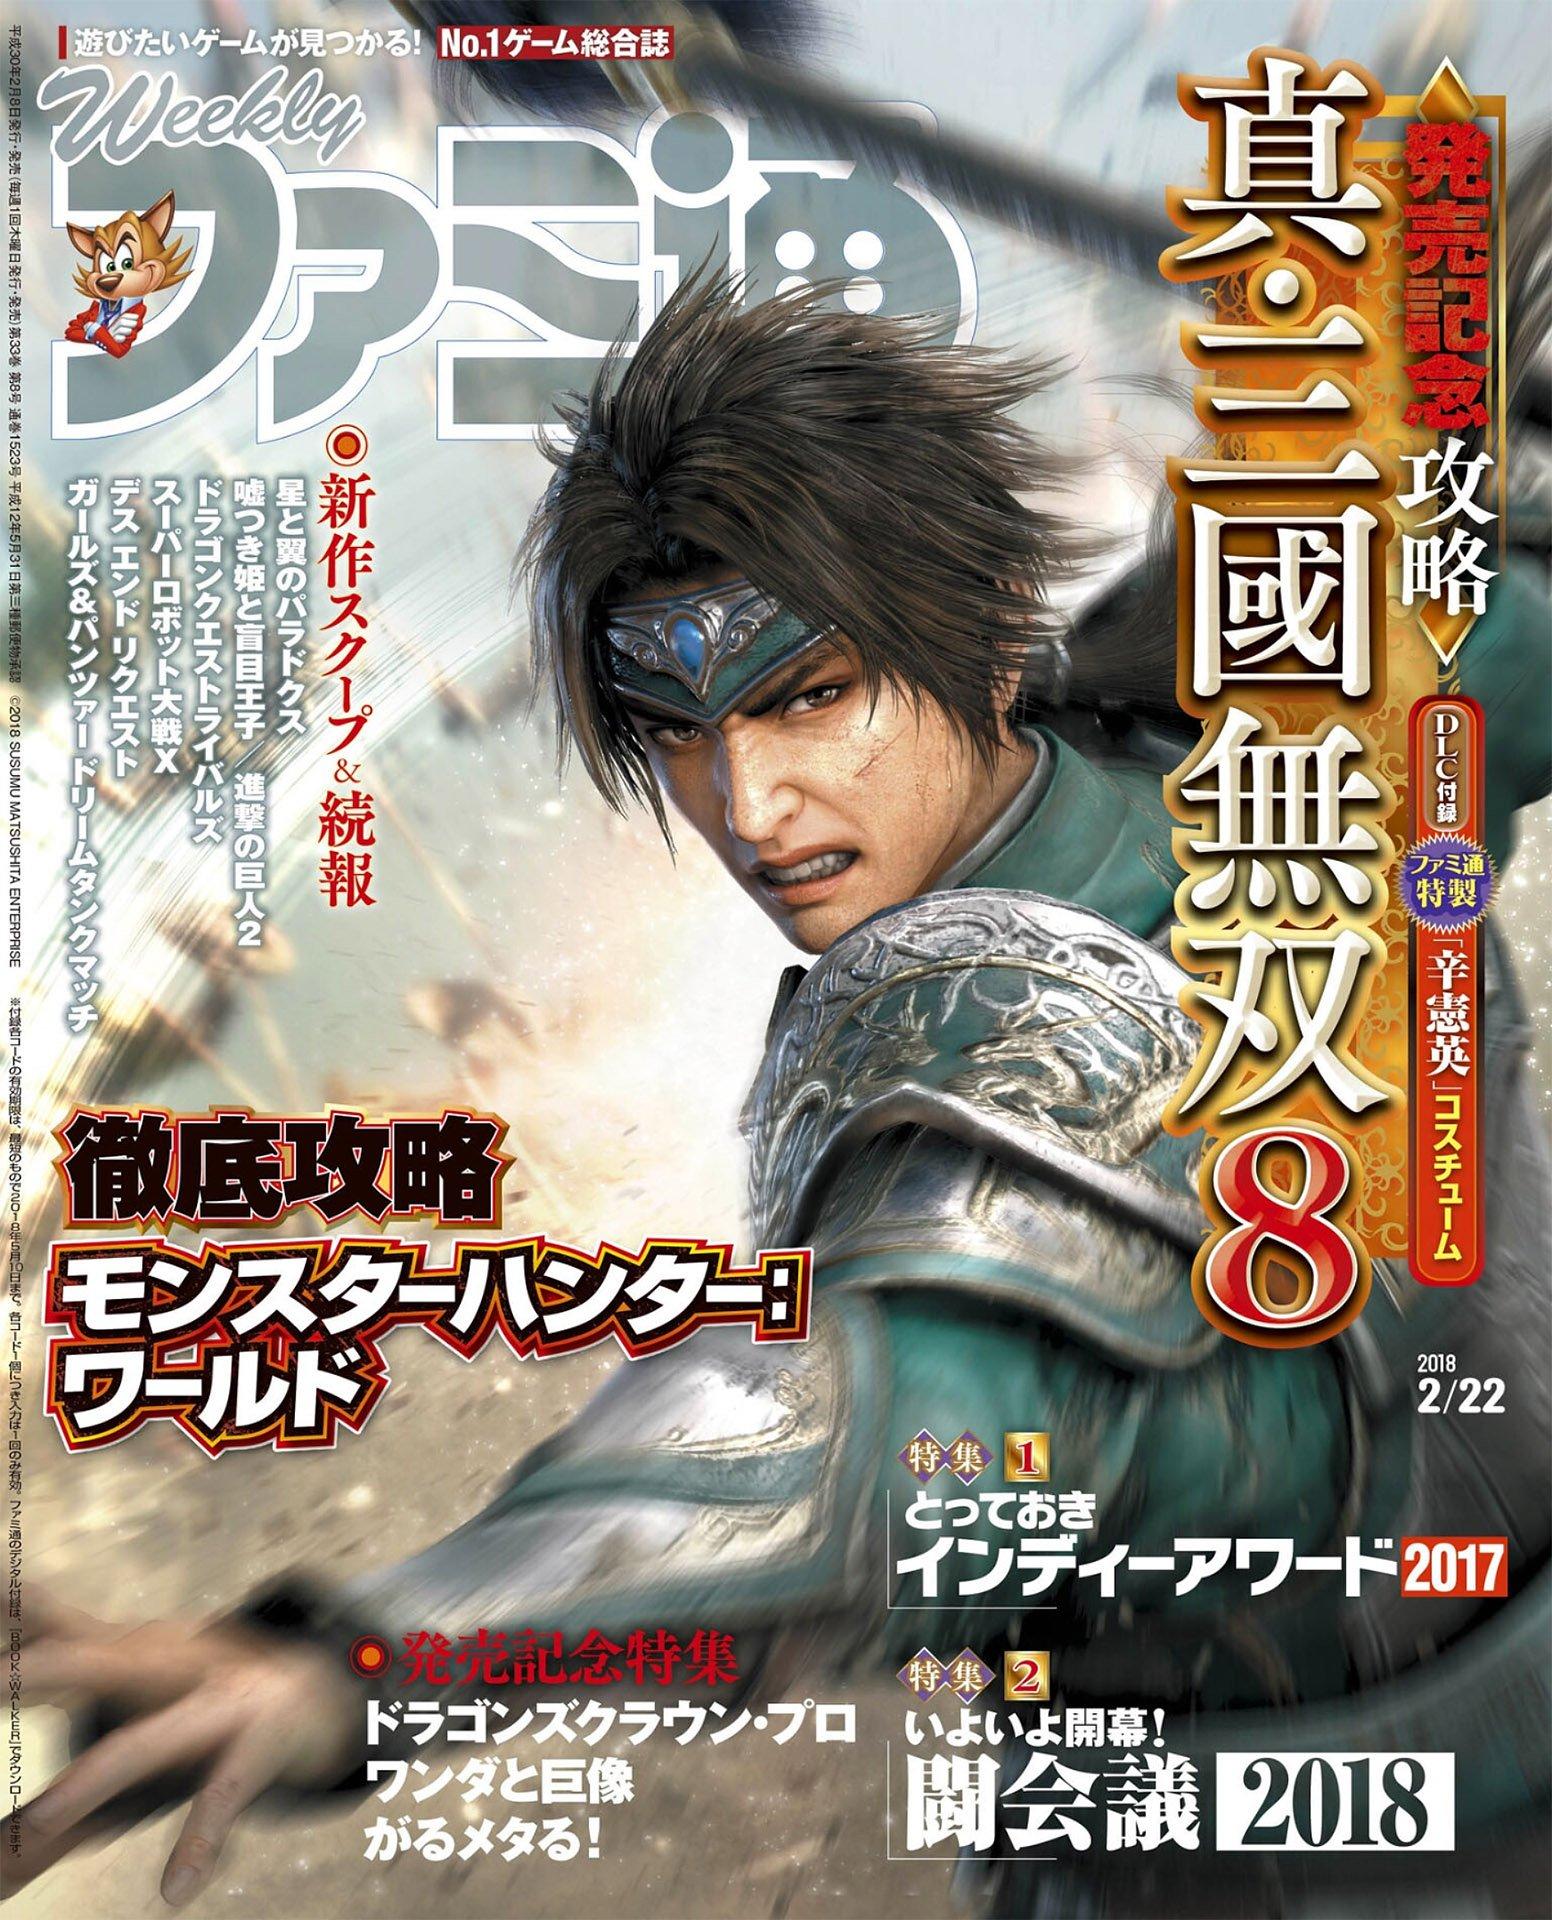 Famitsu 1523 (February 22, 2018)